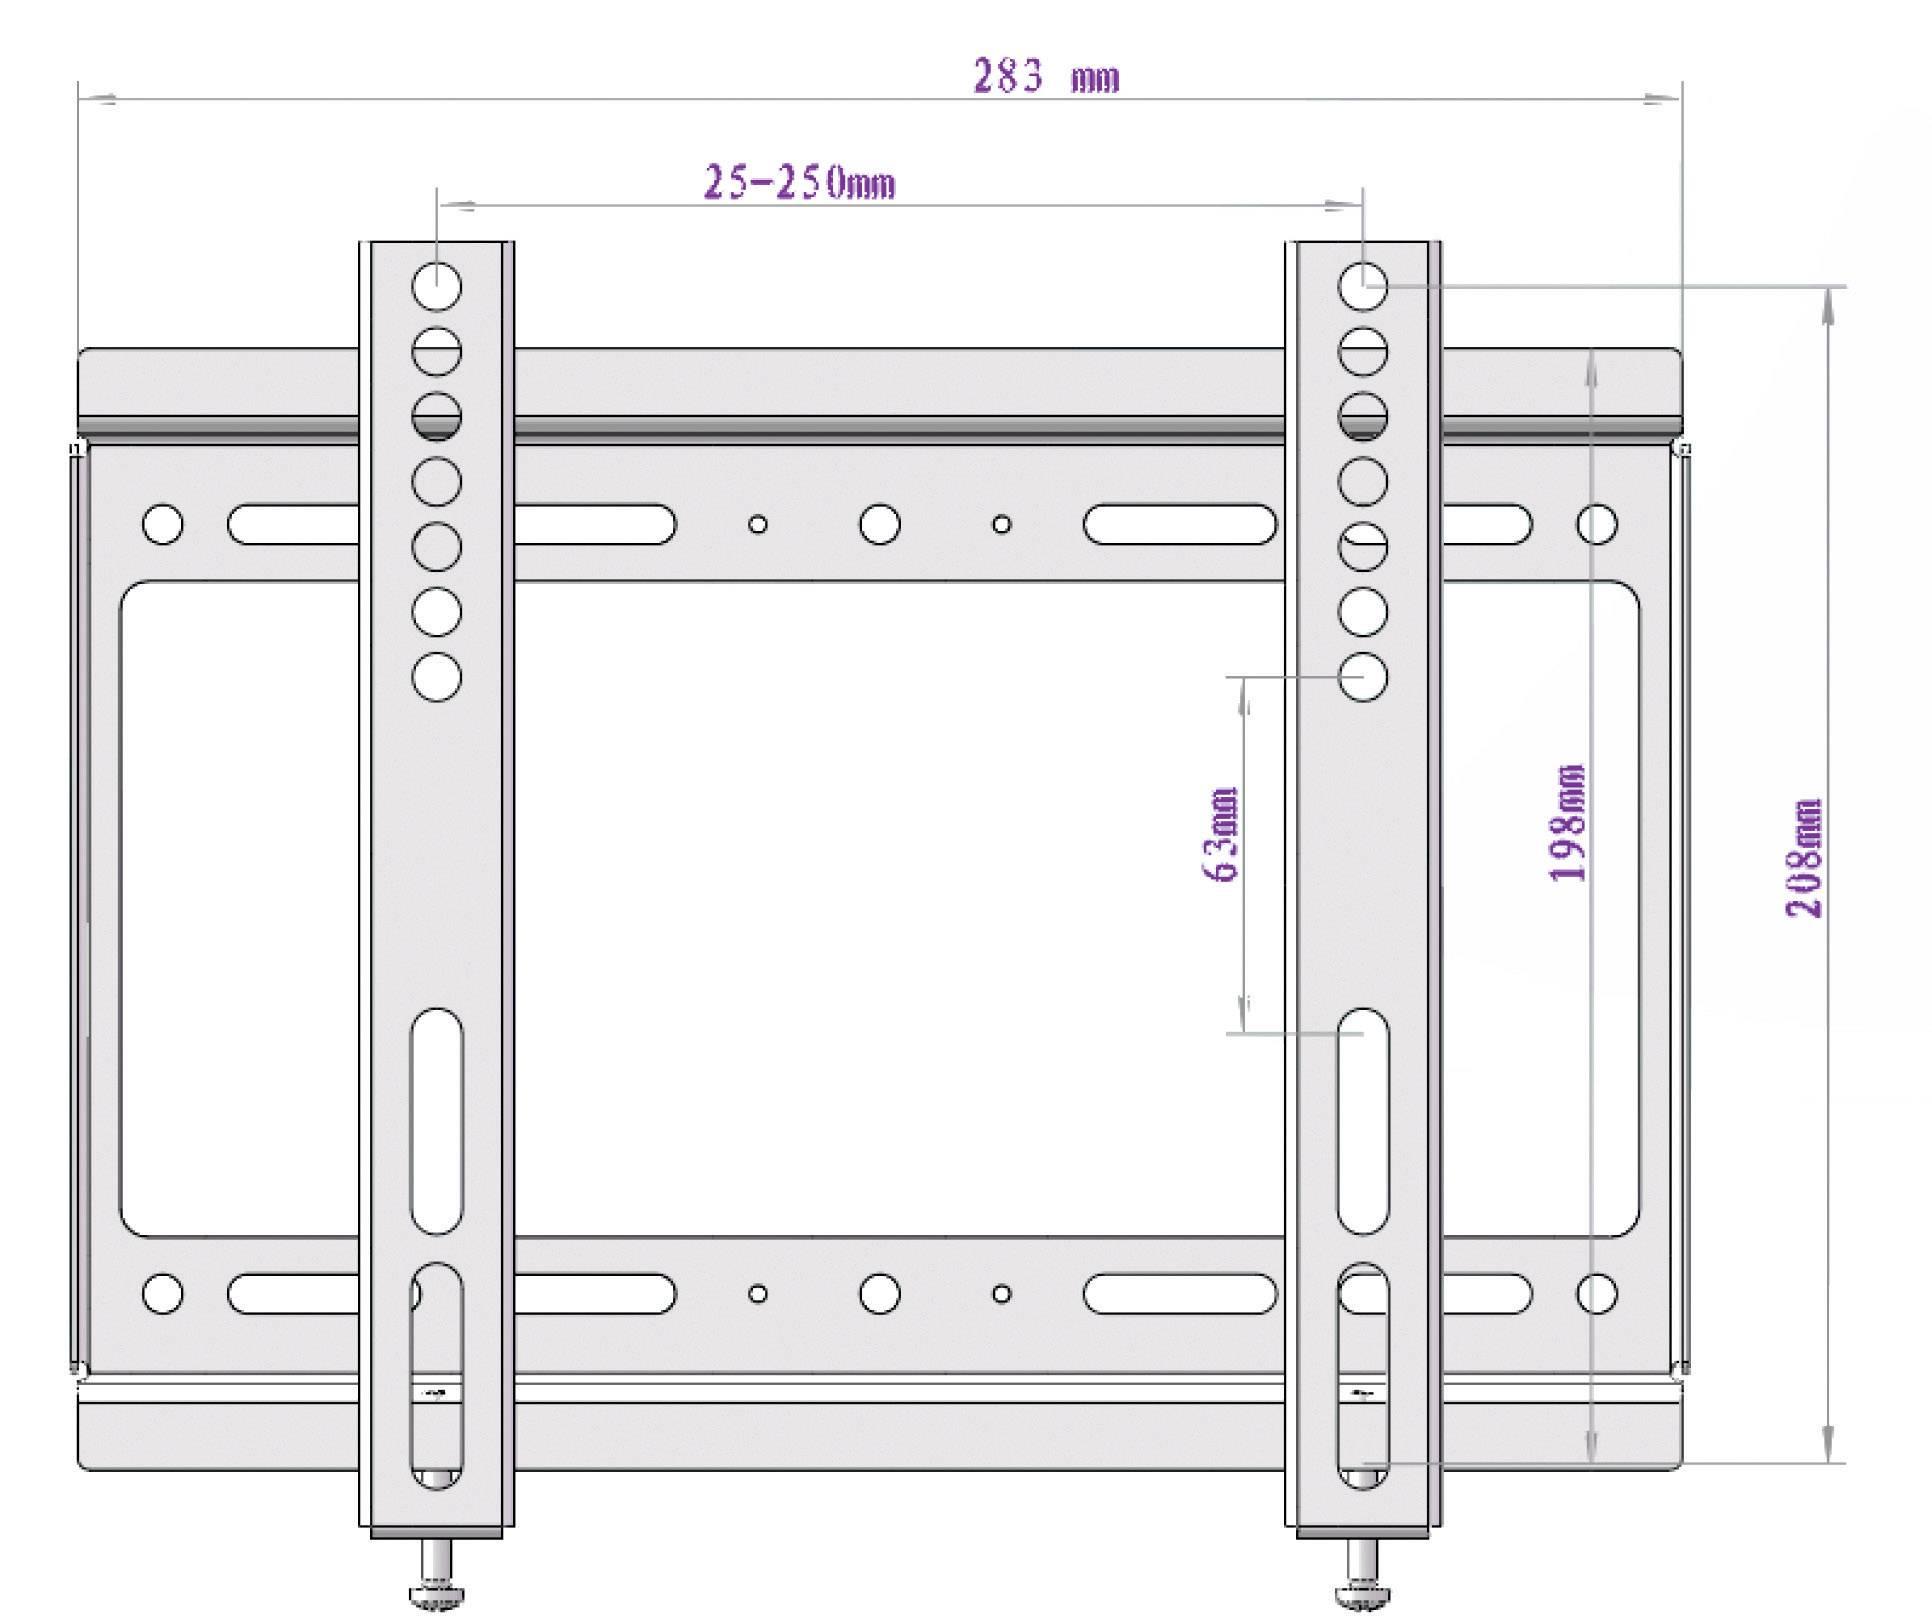 "Nástenný TV držiak Speak Professional TV-WH SLIM FIX 14Z-42Z, 14"" - 37"" (35,6 cm - 106,7 cm)"